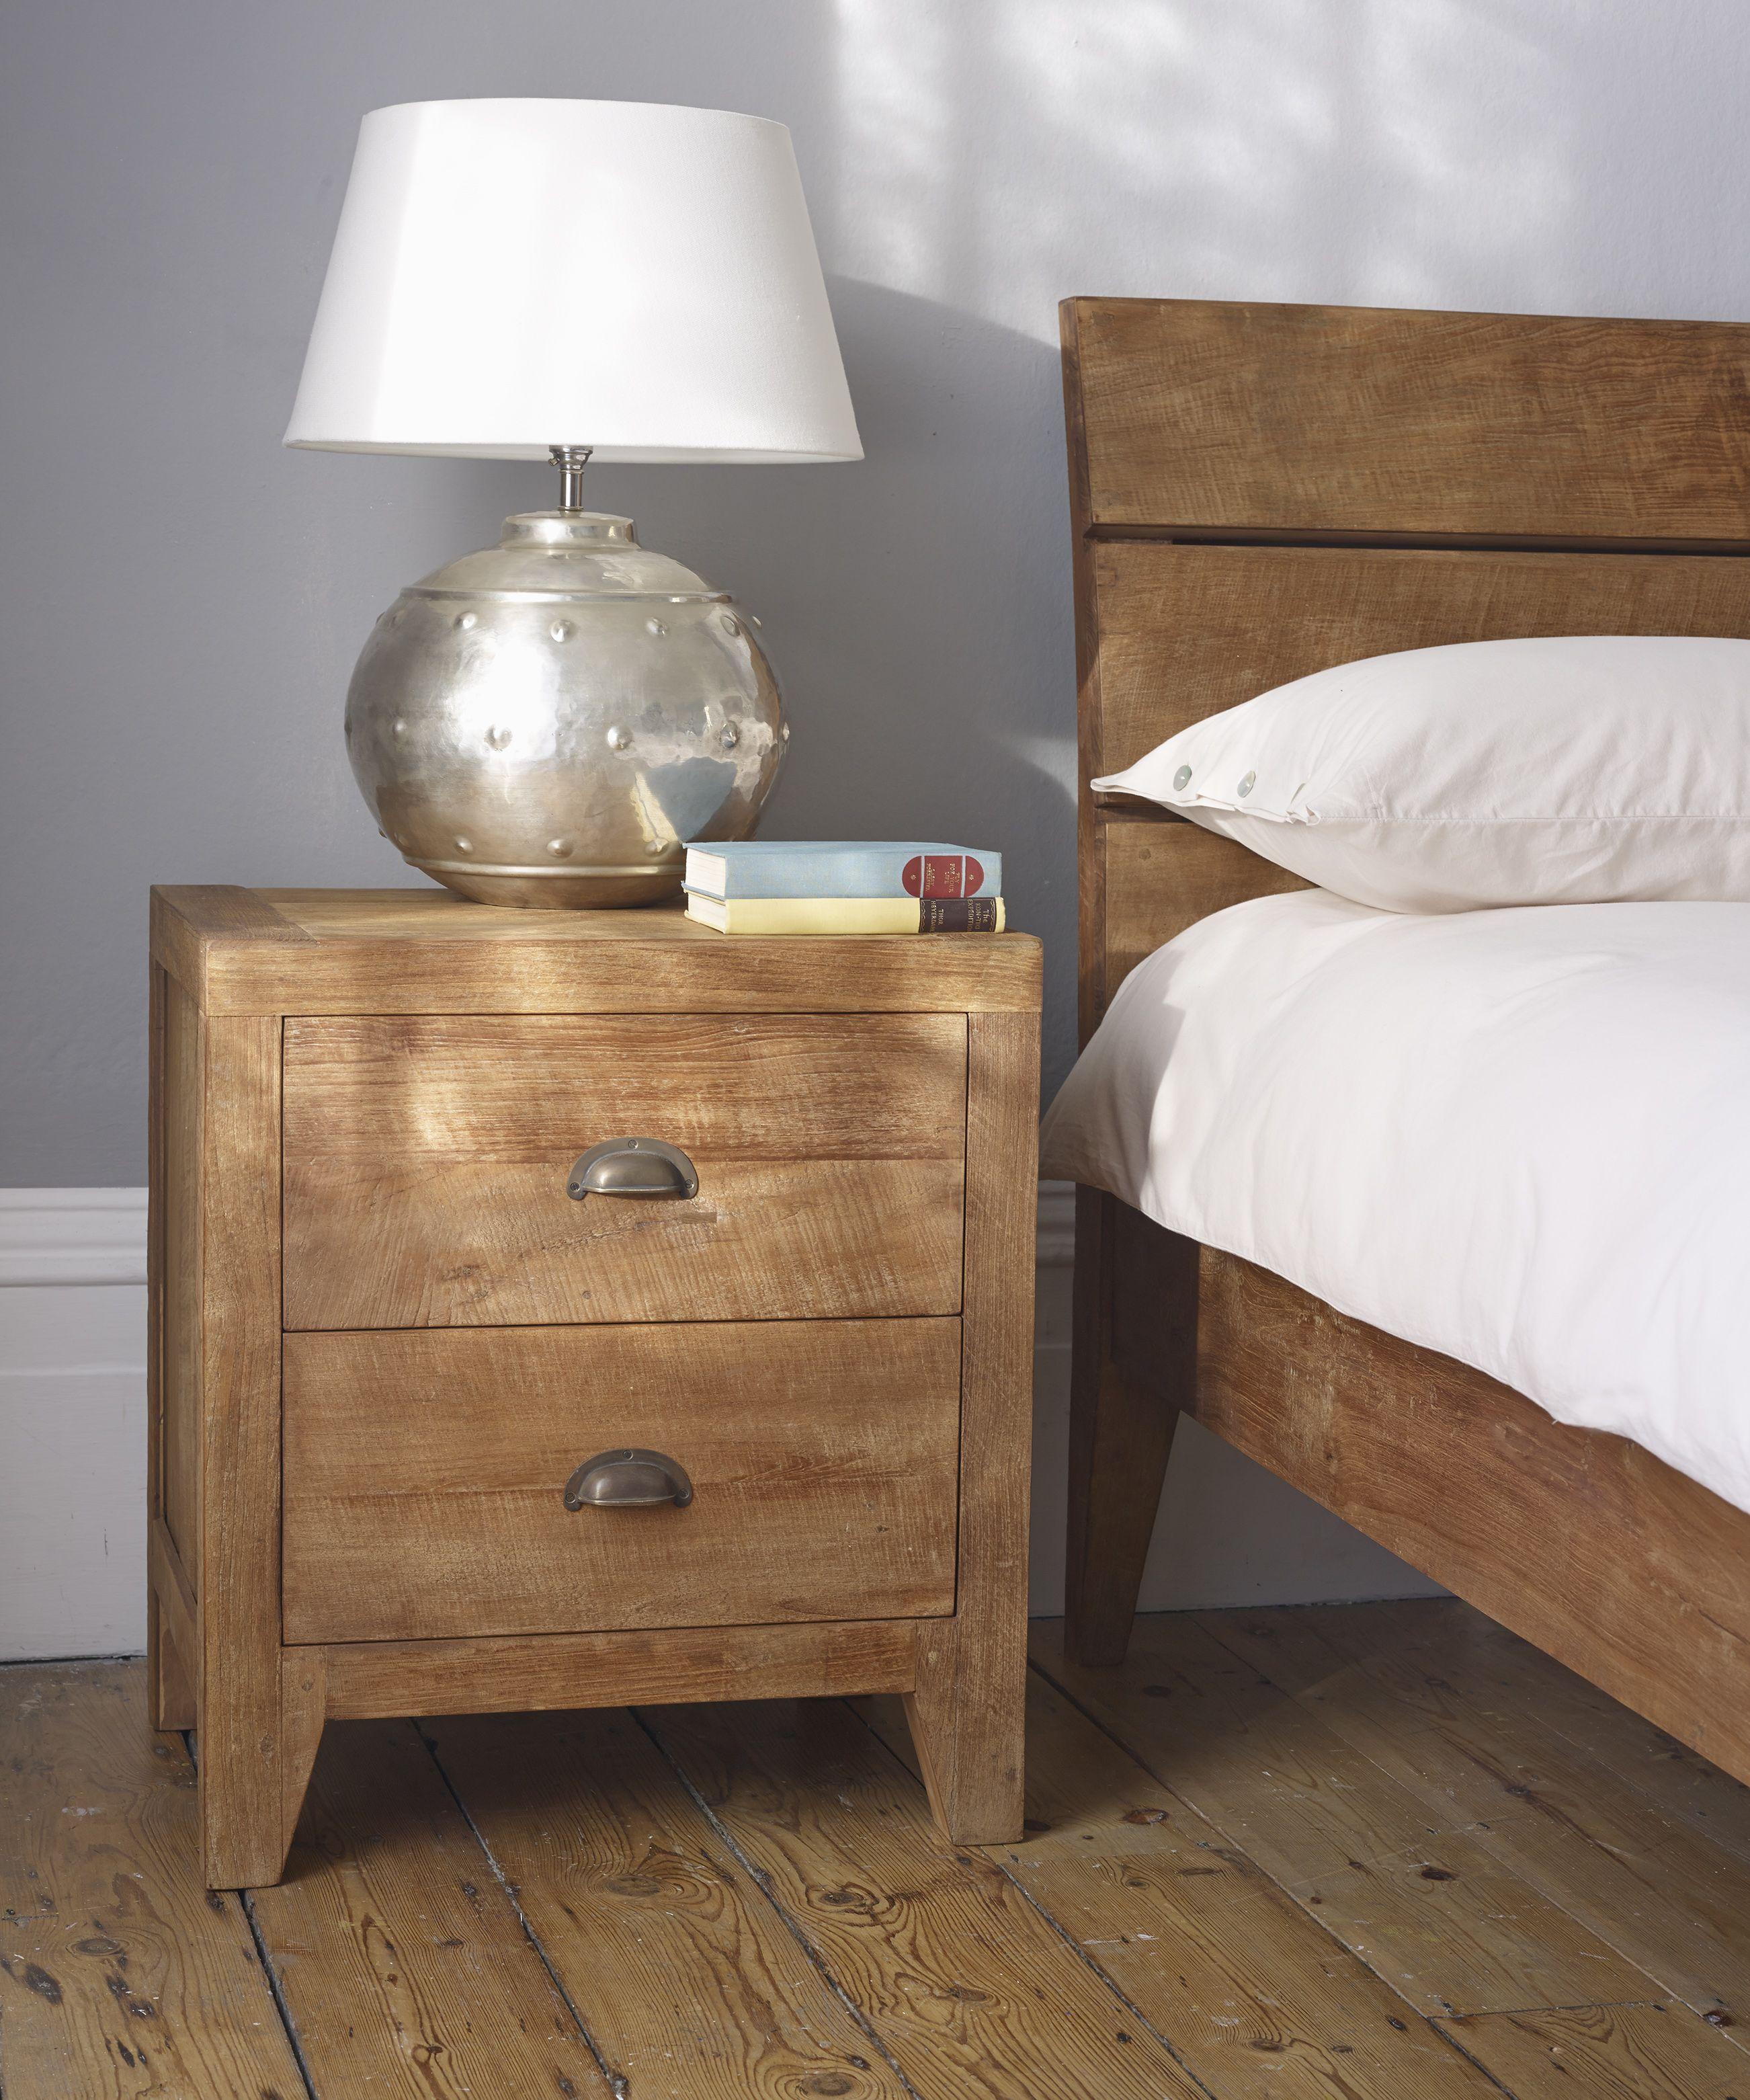 Sumatra Large Bedside Table Hand Crafted Vintage Handles Light